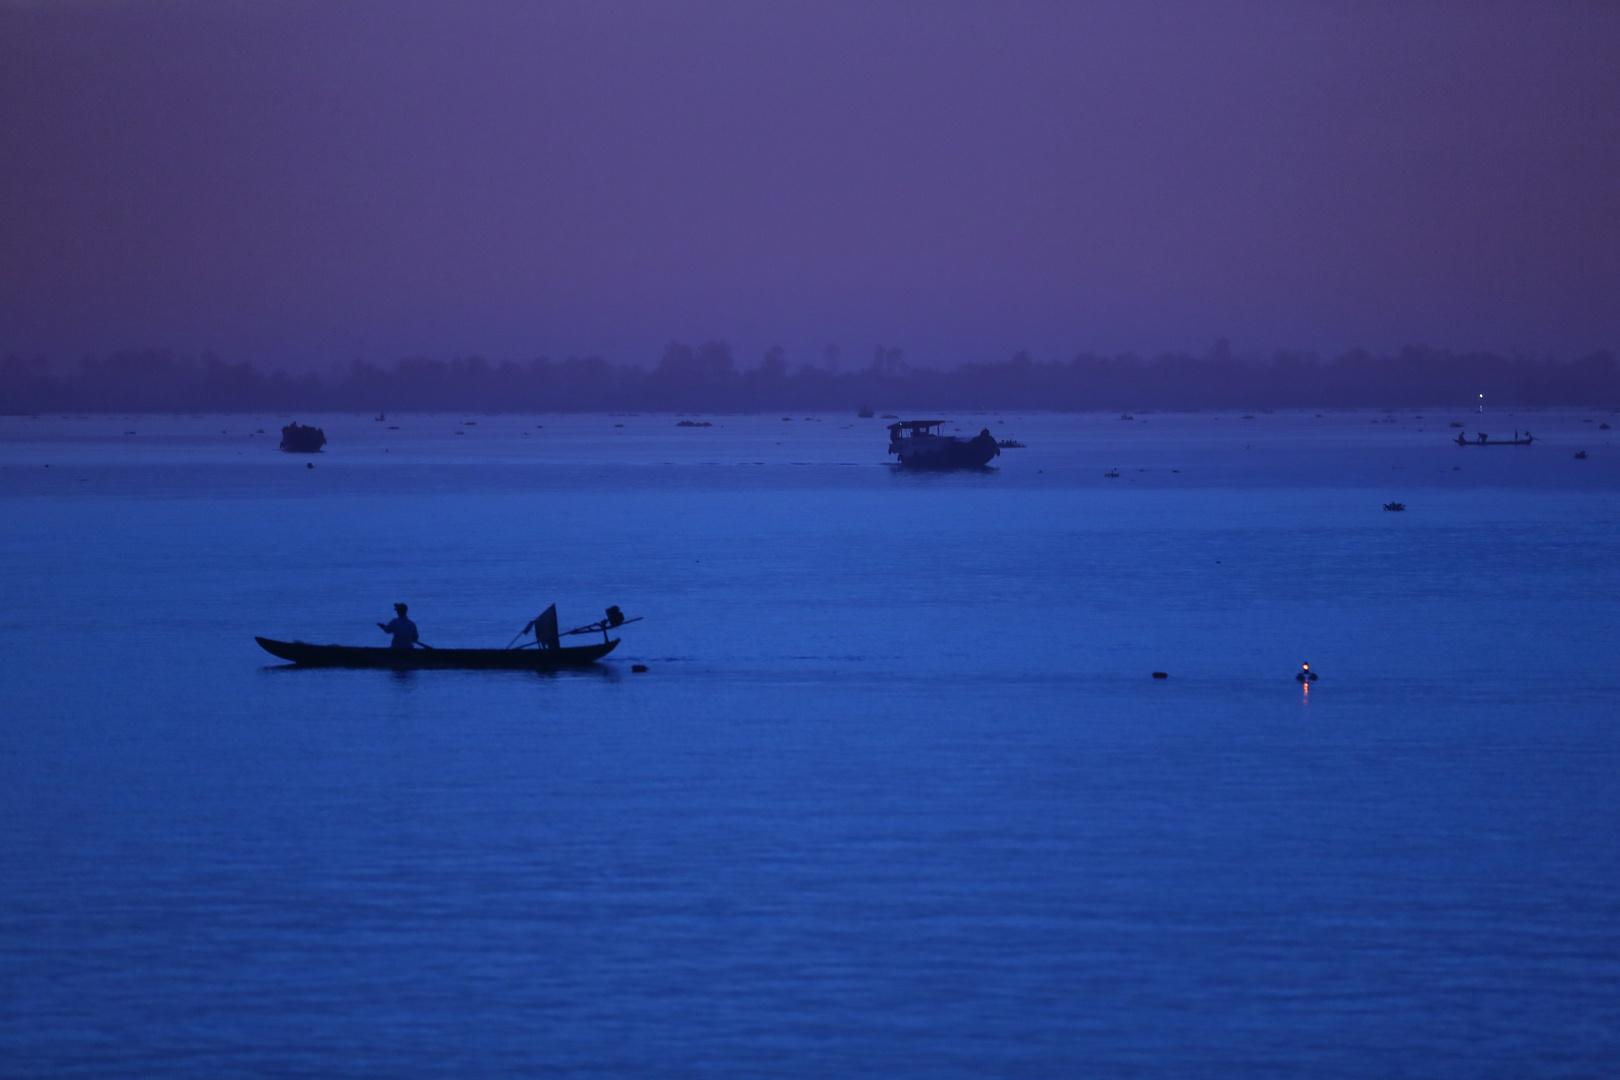 Mekong, Sonnenaufgang